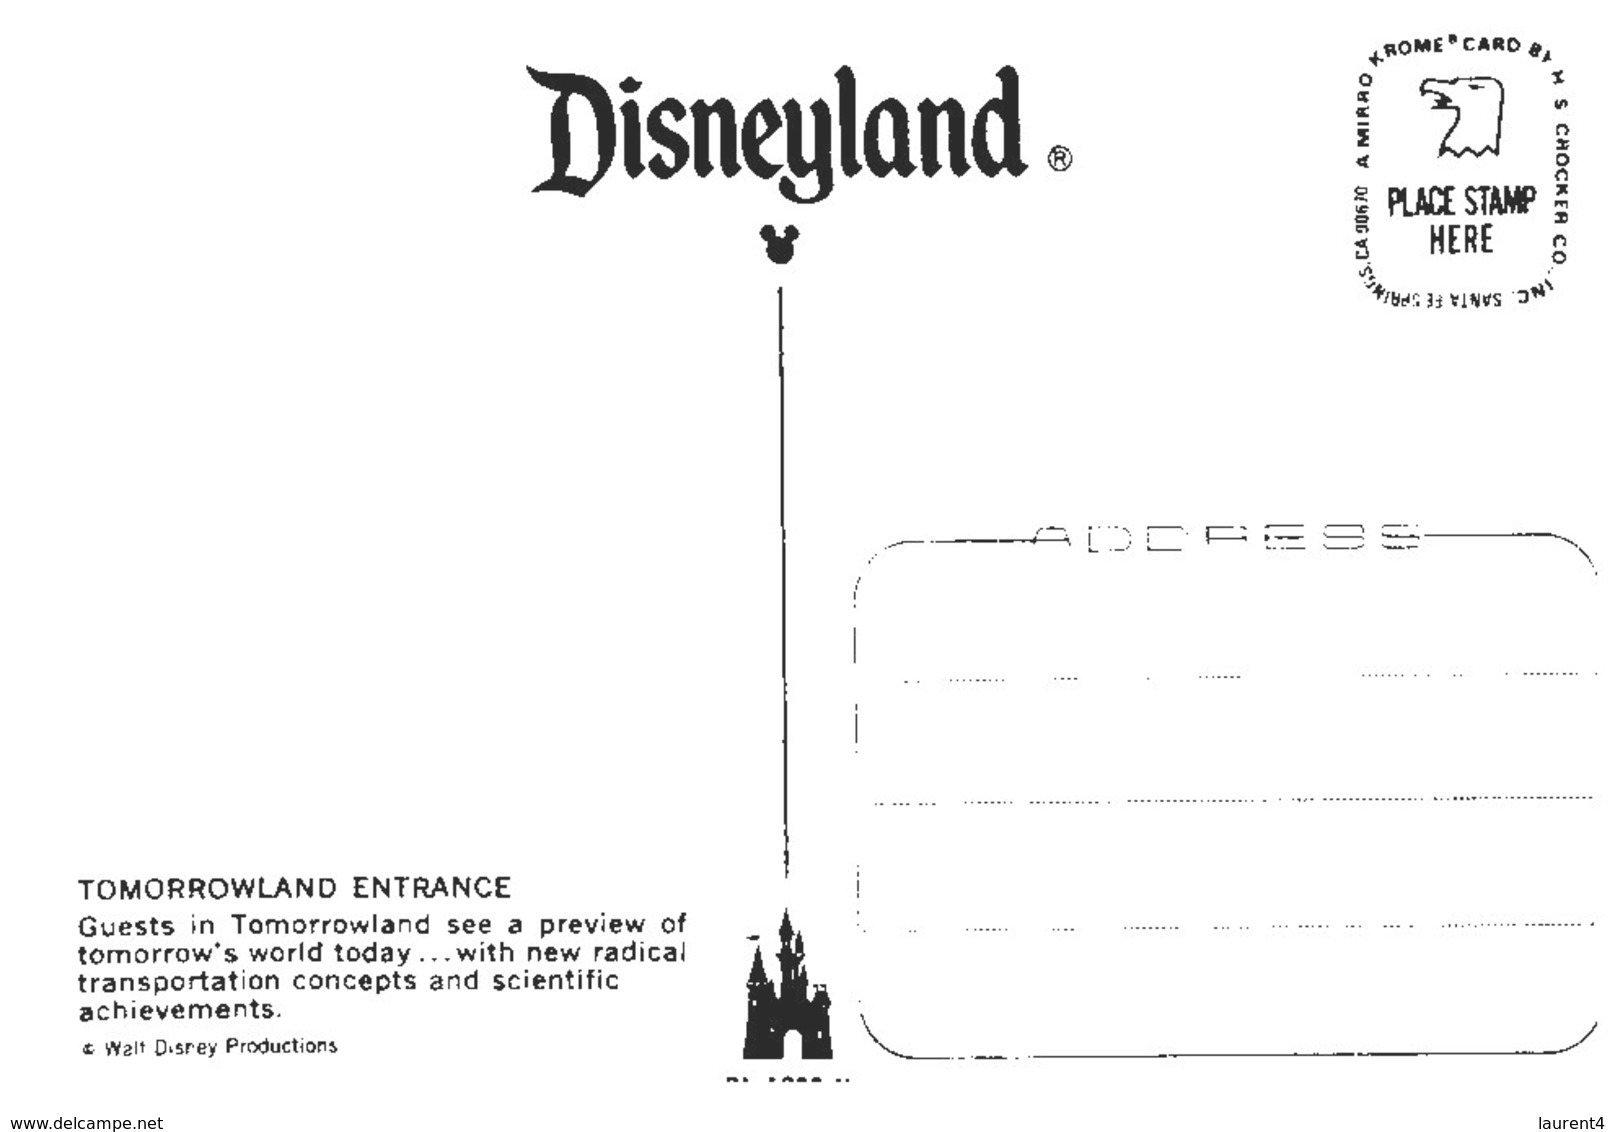 (7777) Dineyland - Tomorrowlands - Disneyland